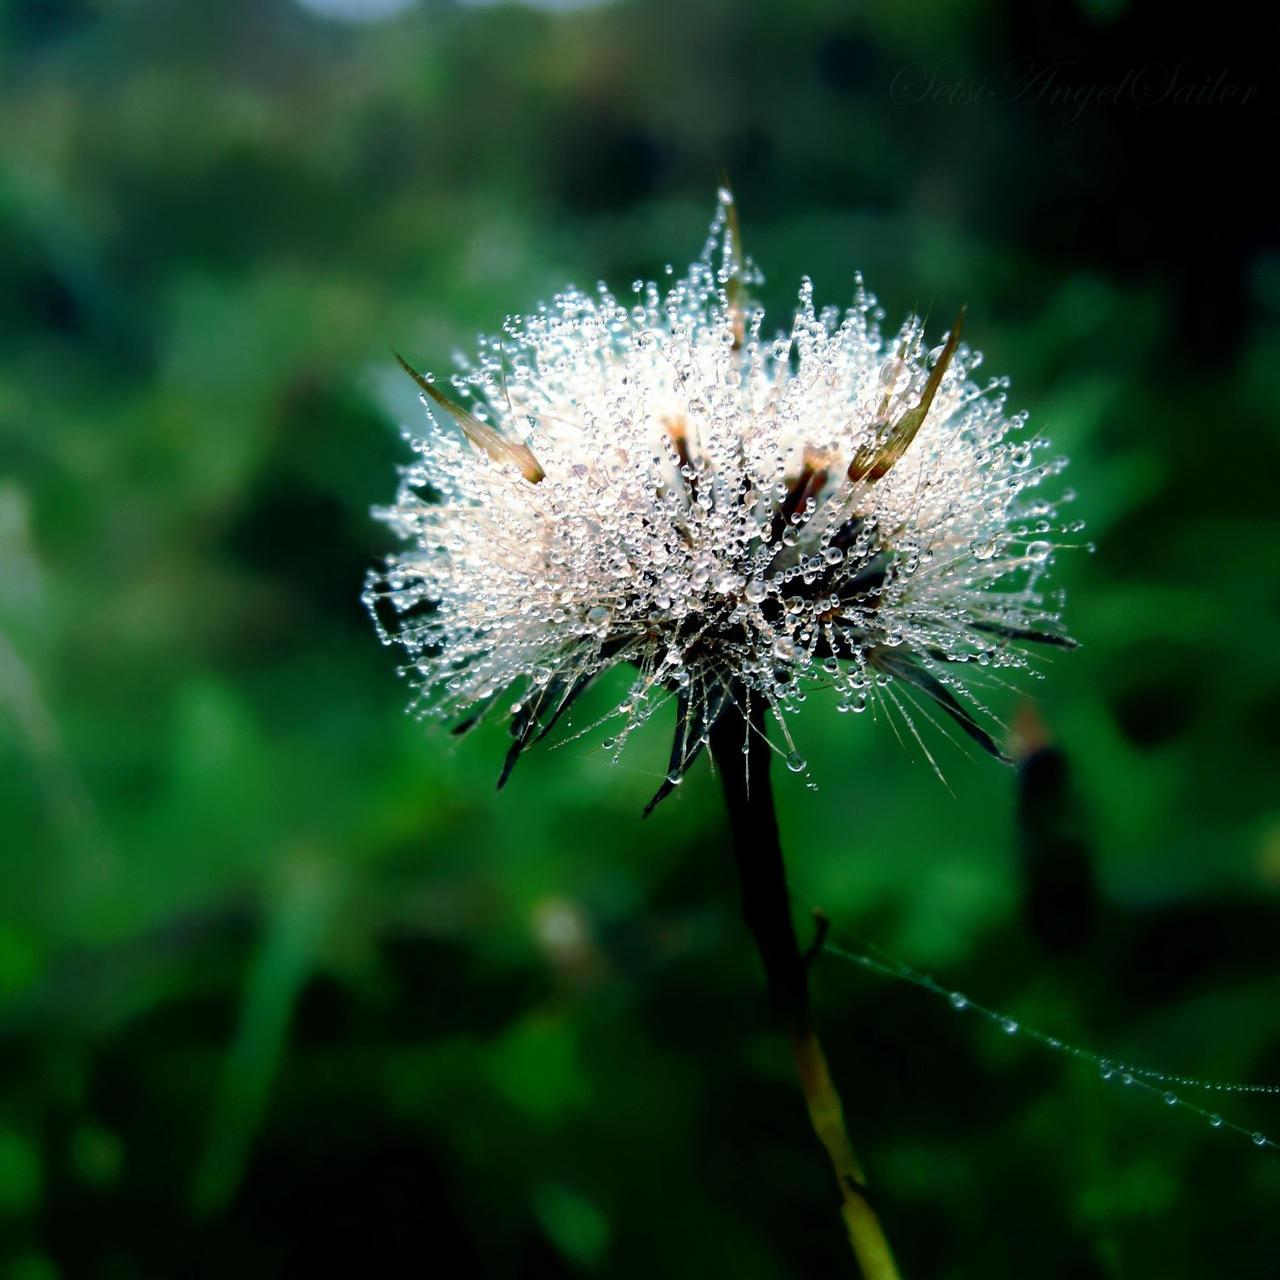 fluffy tears by Angie-AgnieszkaB